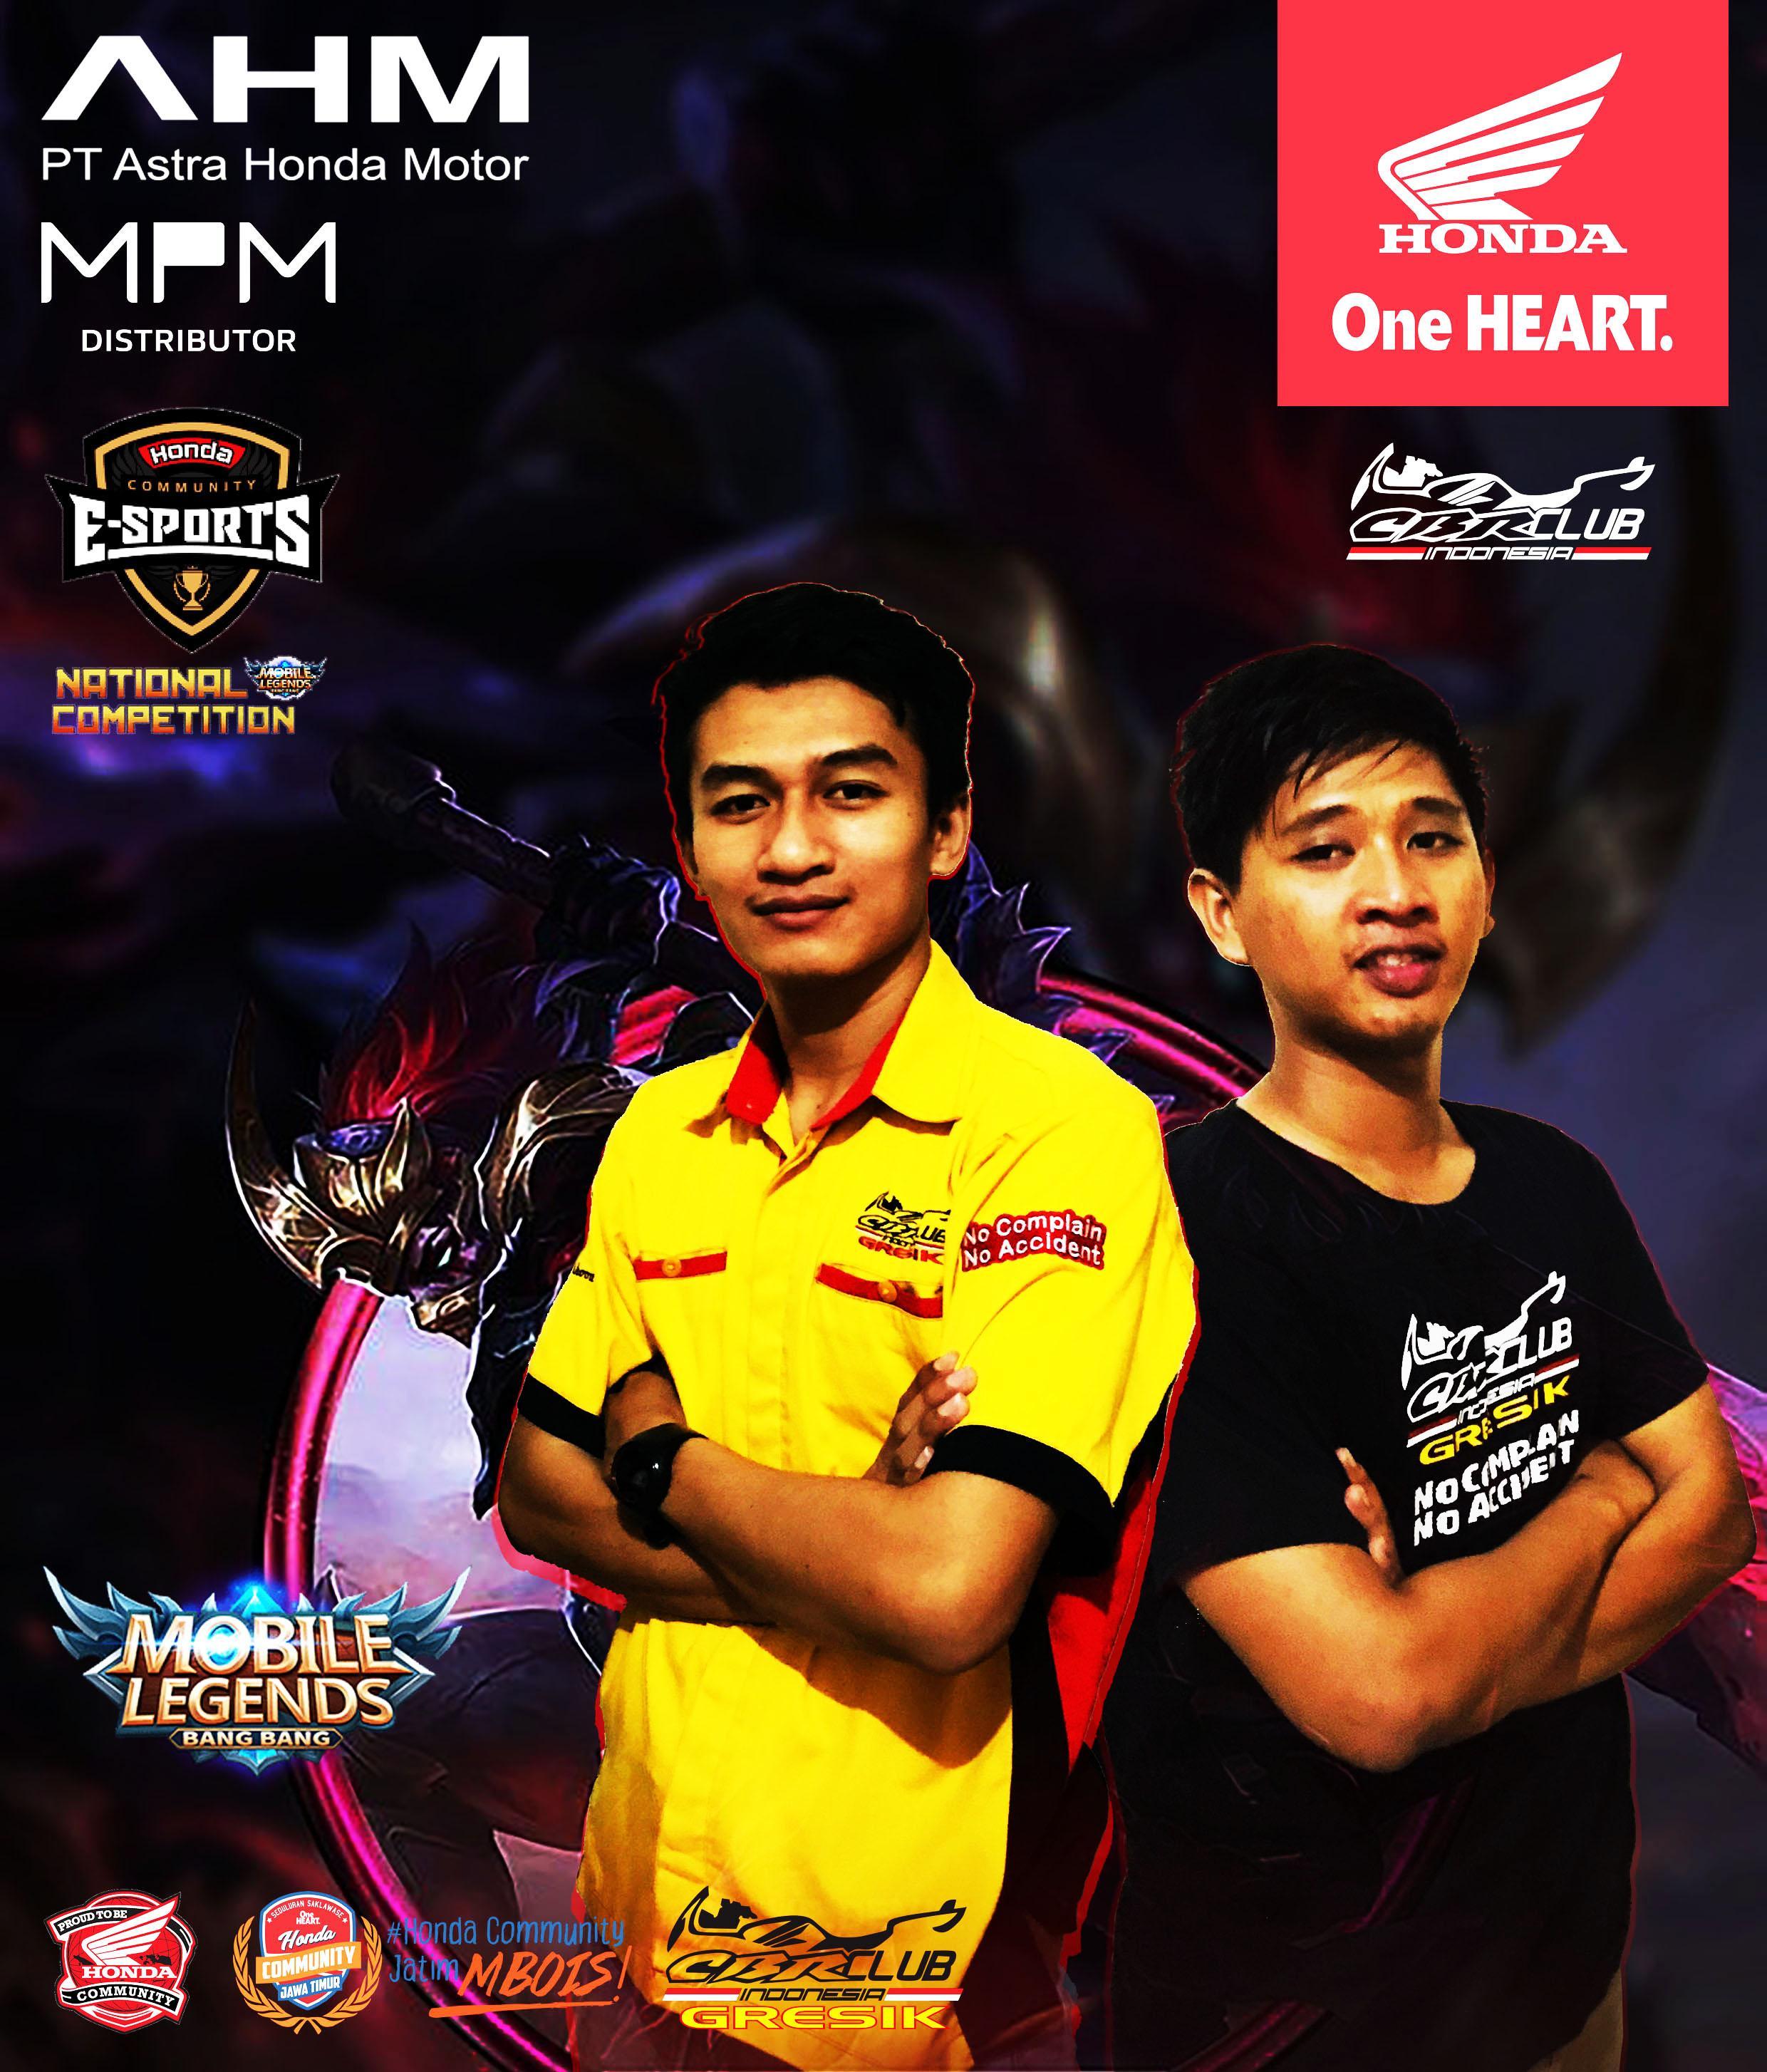 CCI Pengda Jatim Loloskan 2 Player Ke Honda Community Esport National Competition